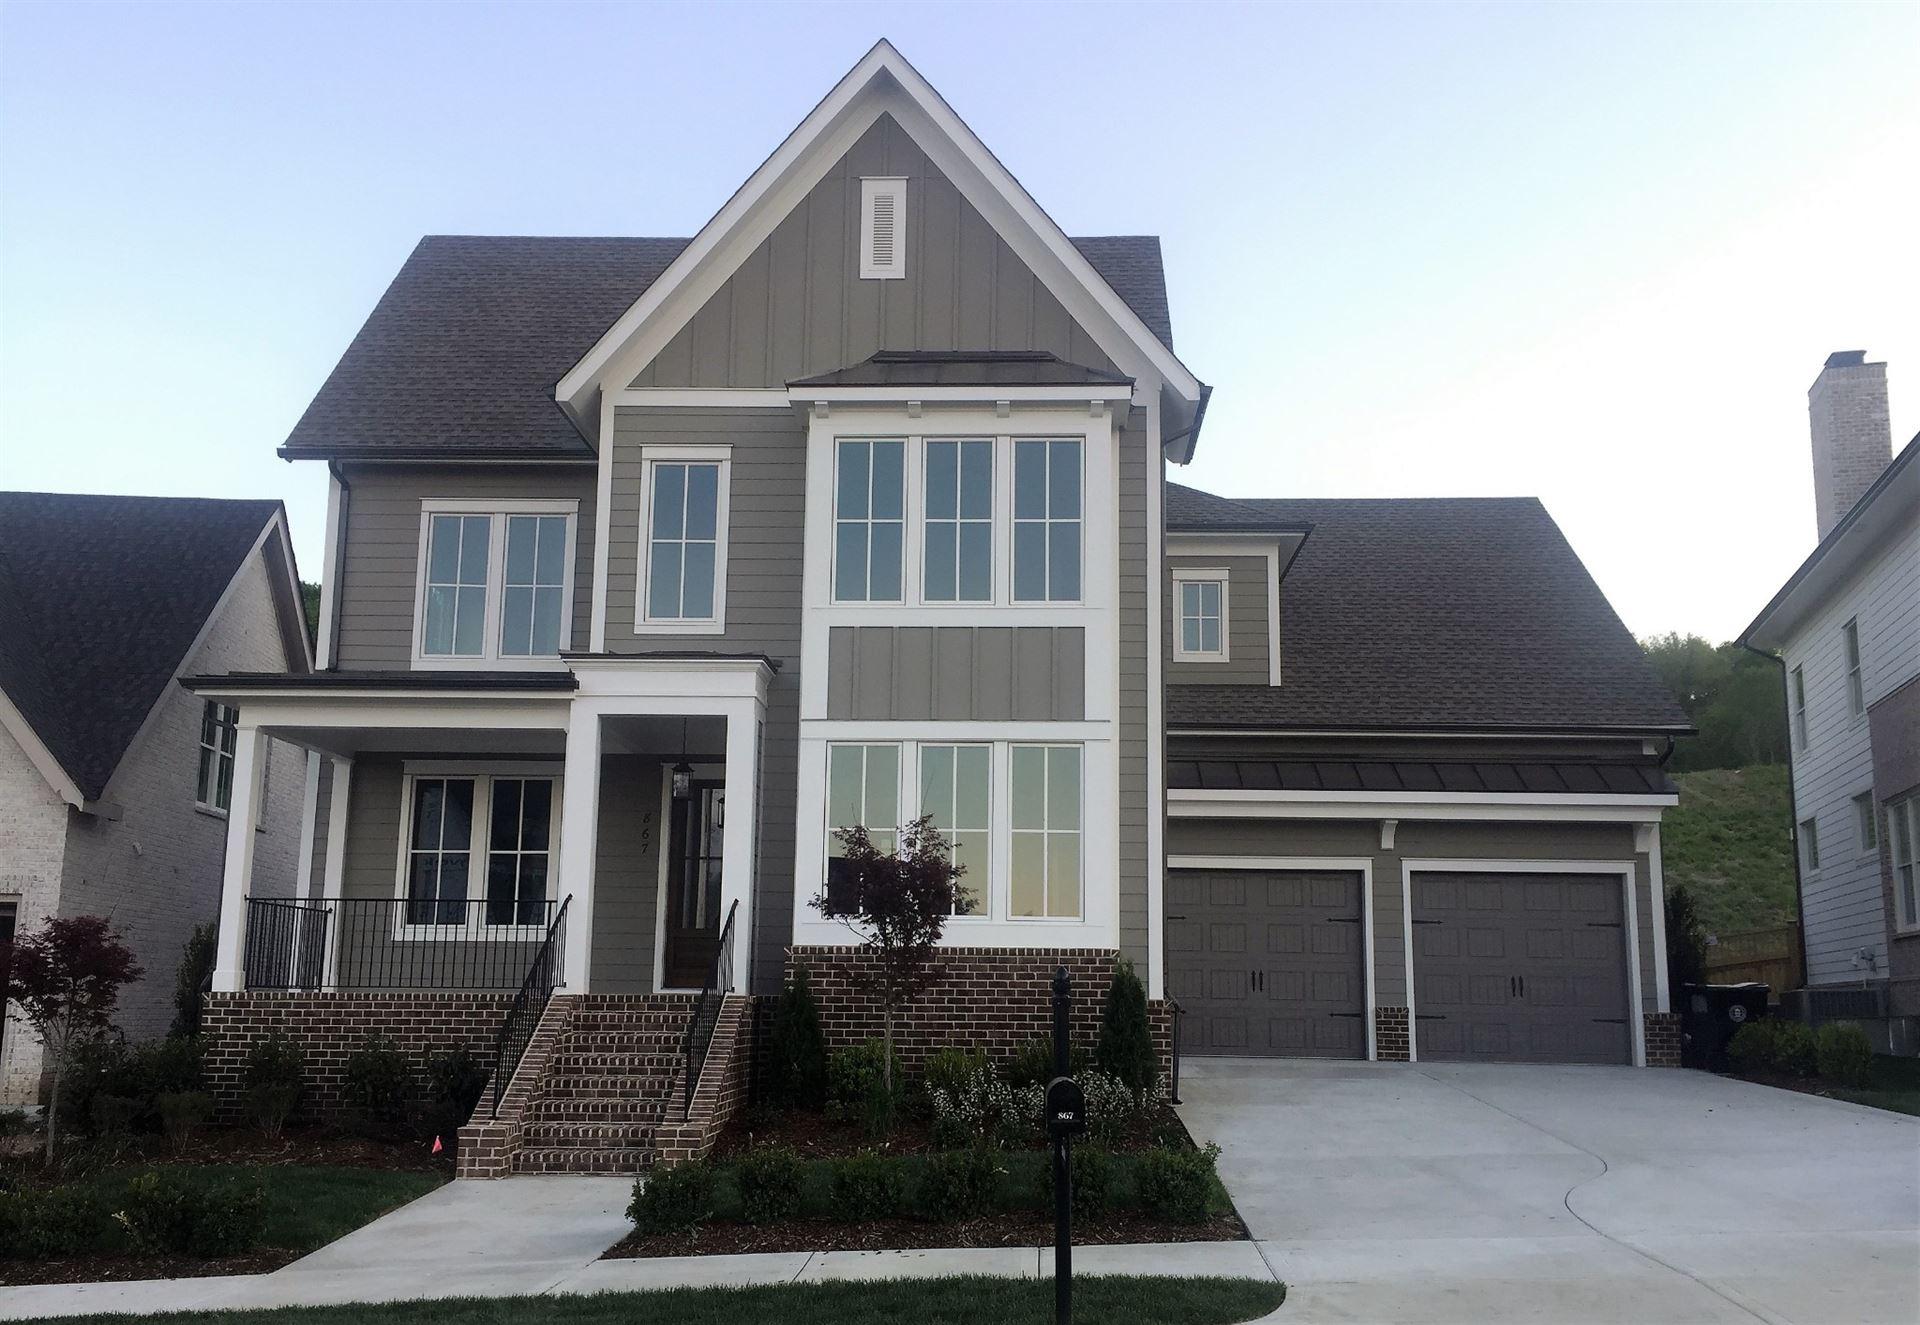 Photo of 867 Cheltenham Avenue # 2146, Franklin, TN 37064 (MLS # 2198252)